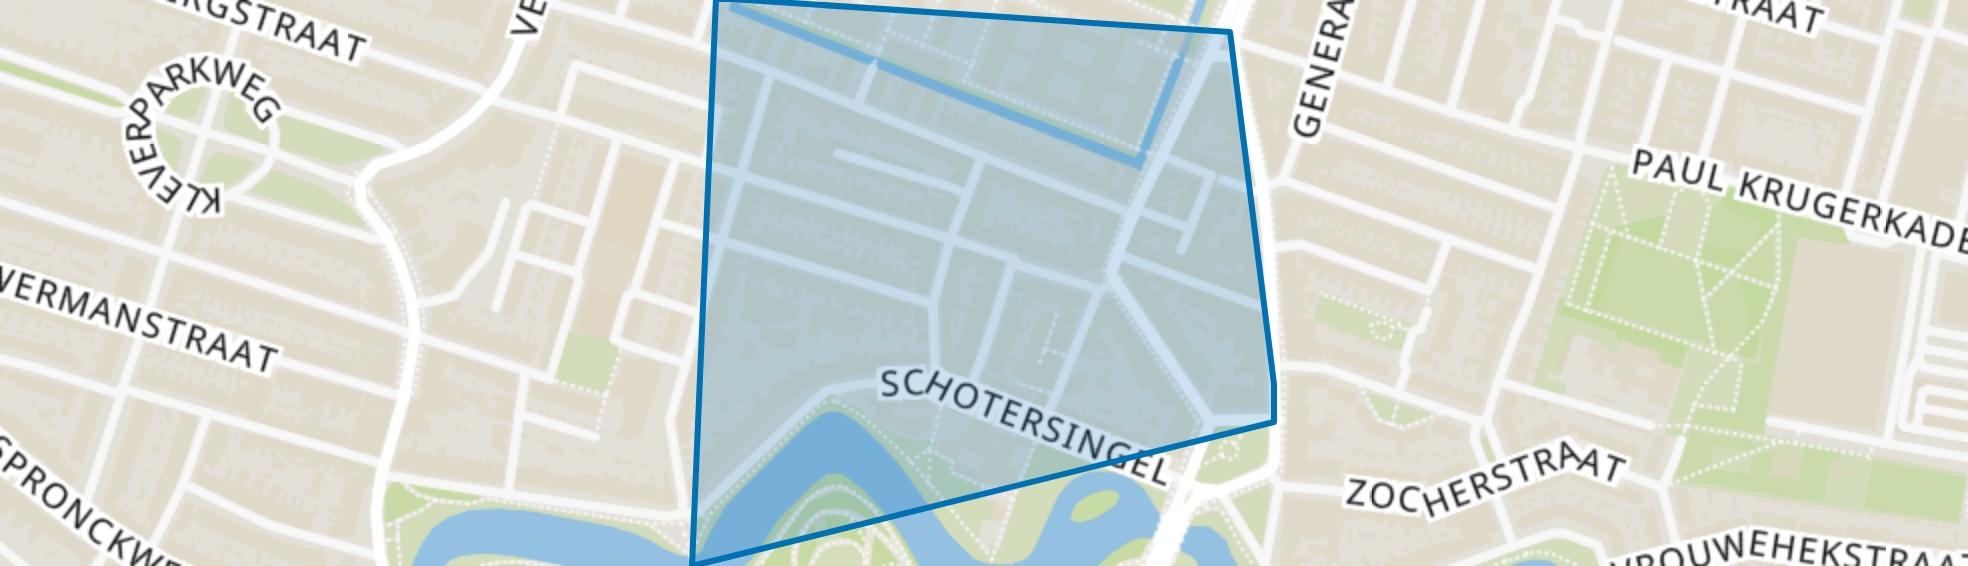 Frans Halsbuurt, Haarlem map